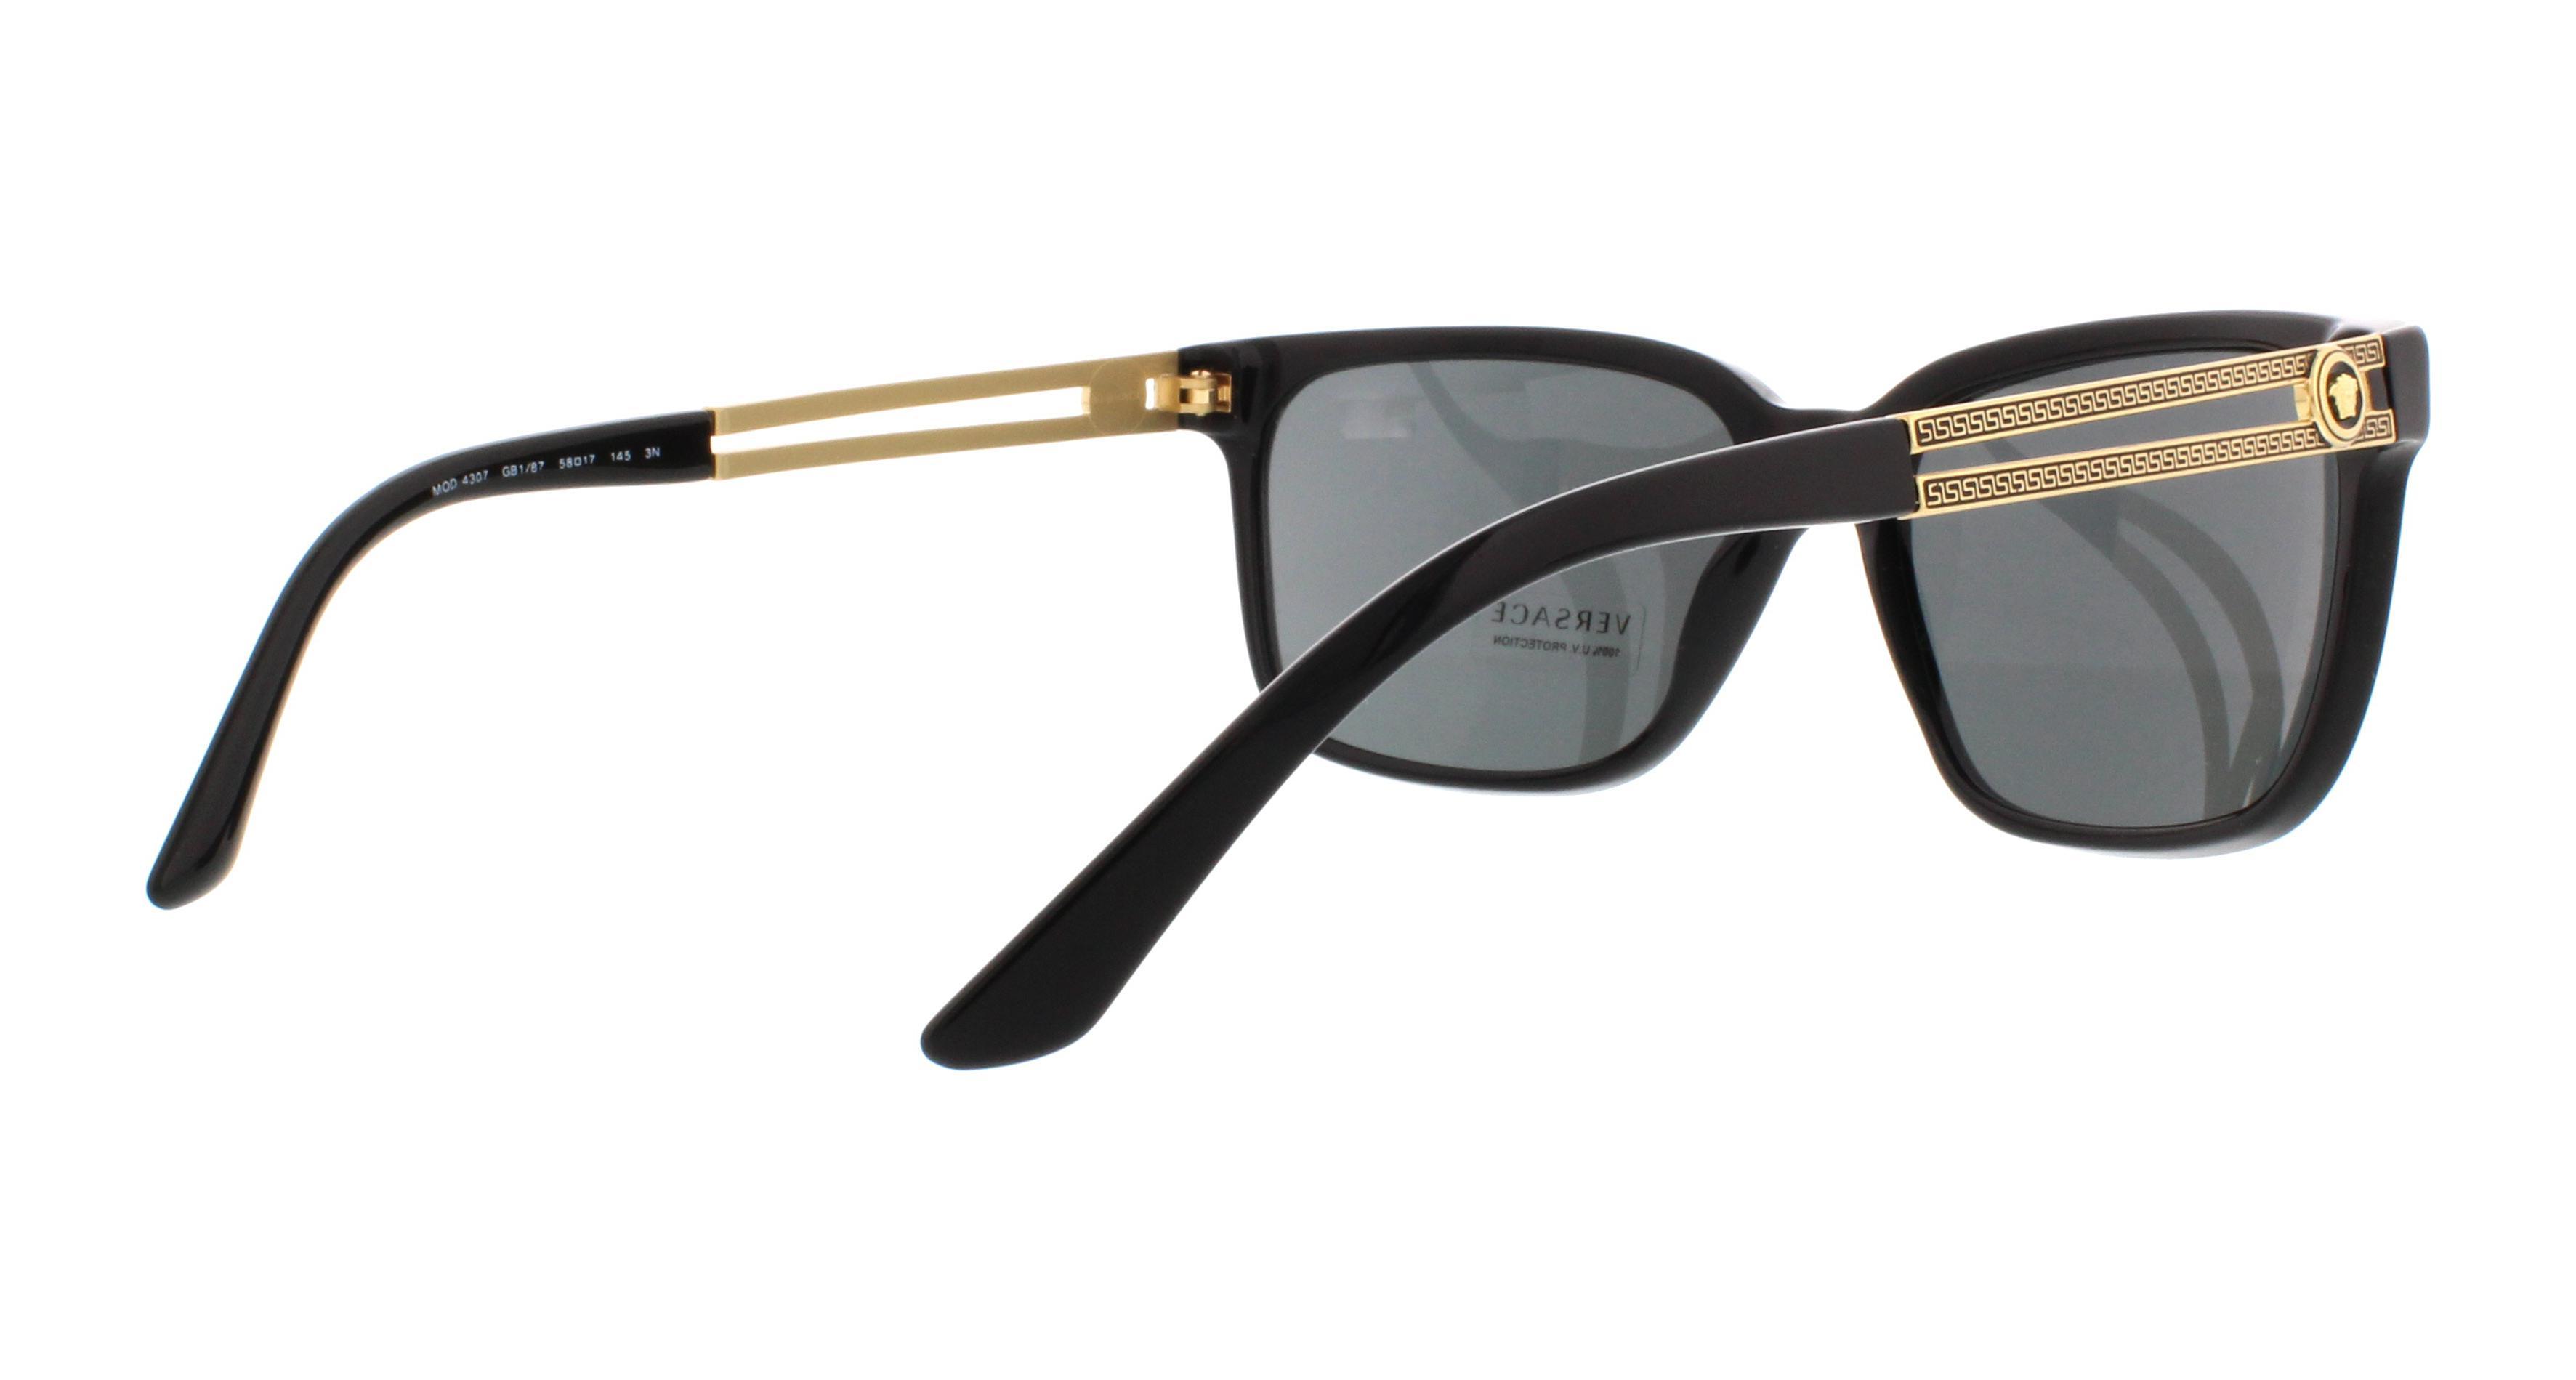 2736061586a19 Versace Sunglasses Versace Tribute Mask Gold Havana Sunglasses Versace  Eyewear Avvenice Source · versace sunglasses Ecosia